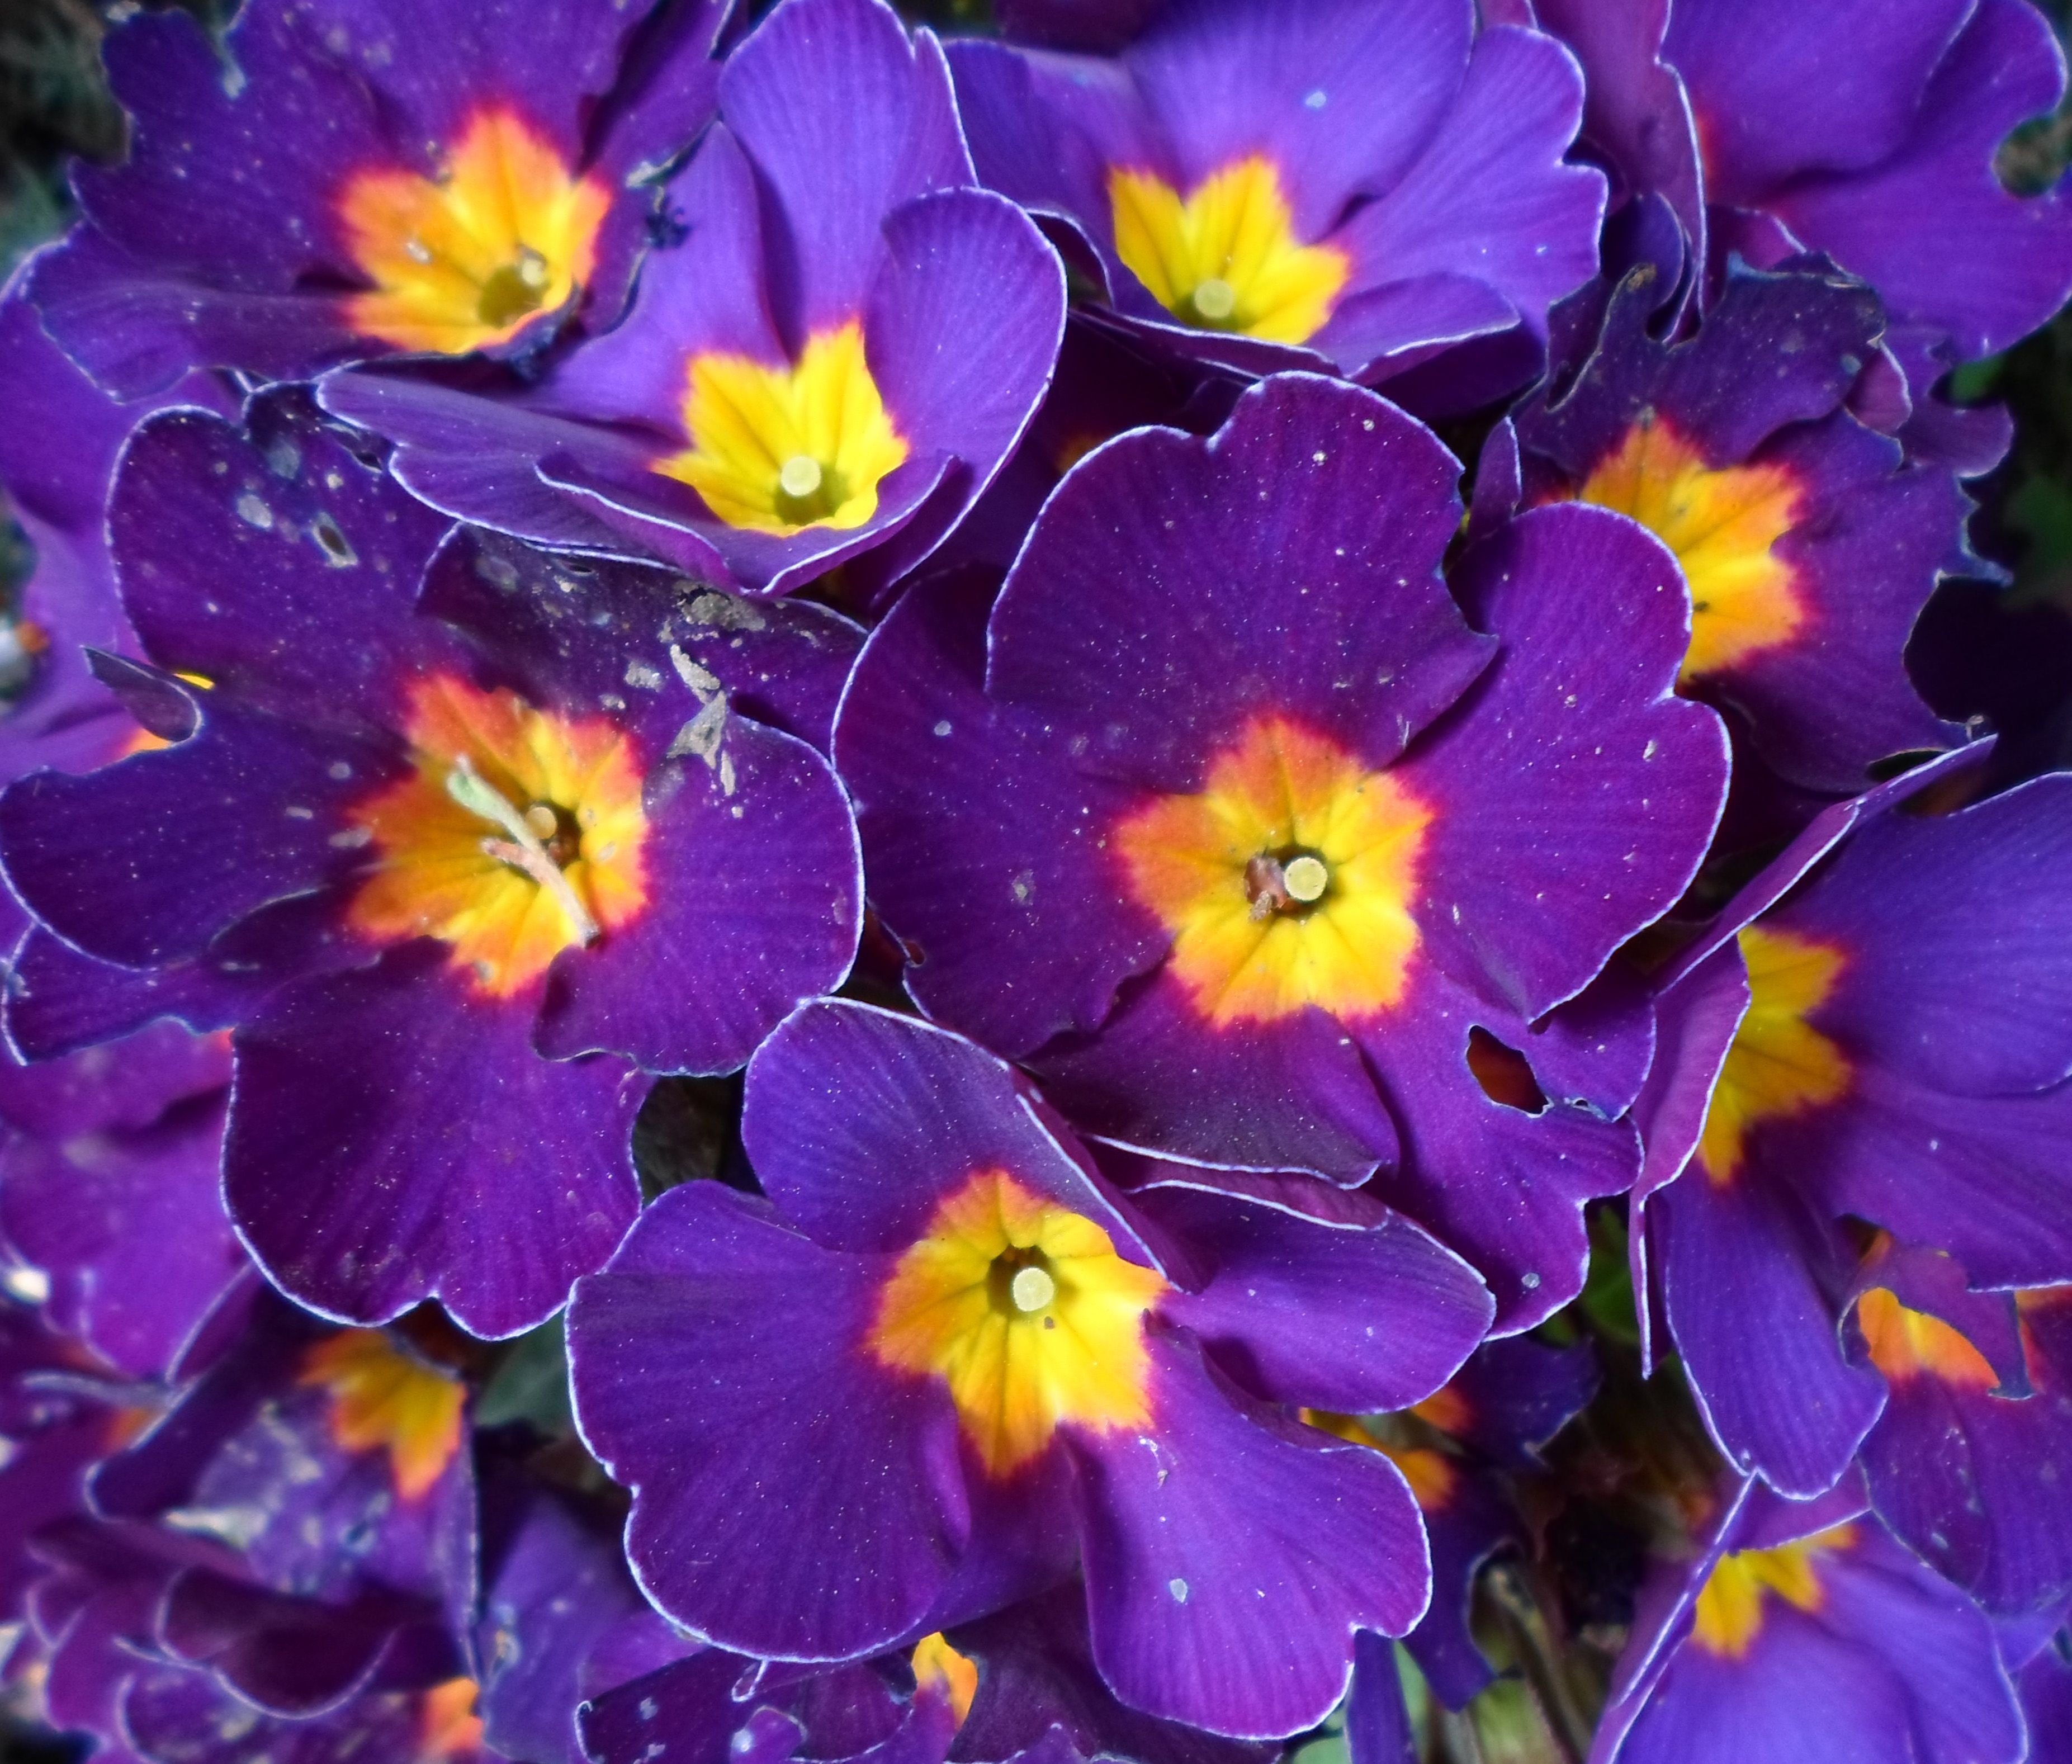 Purple and Yellow Flowers Vulnicura Love. Pinterest